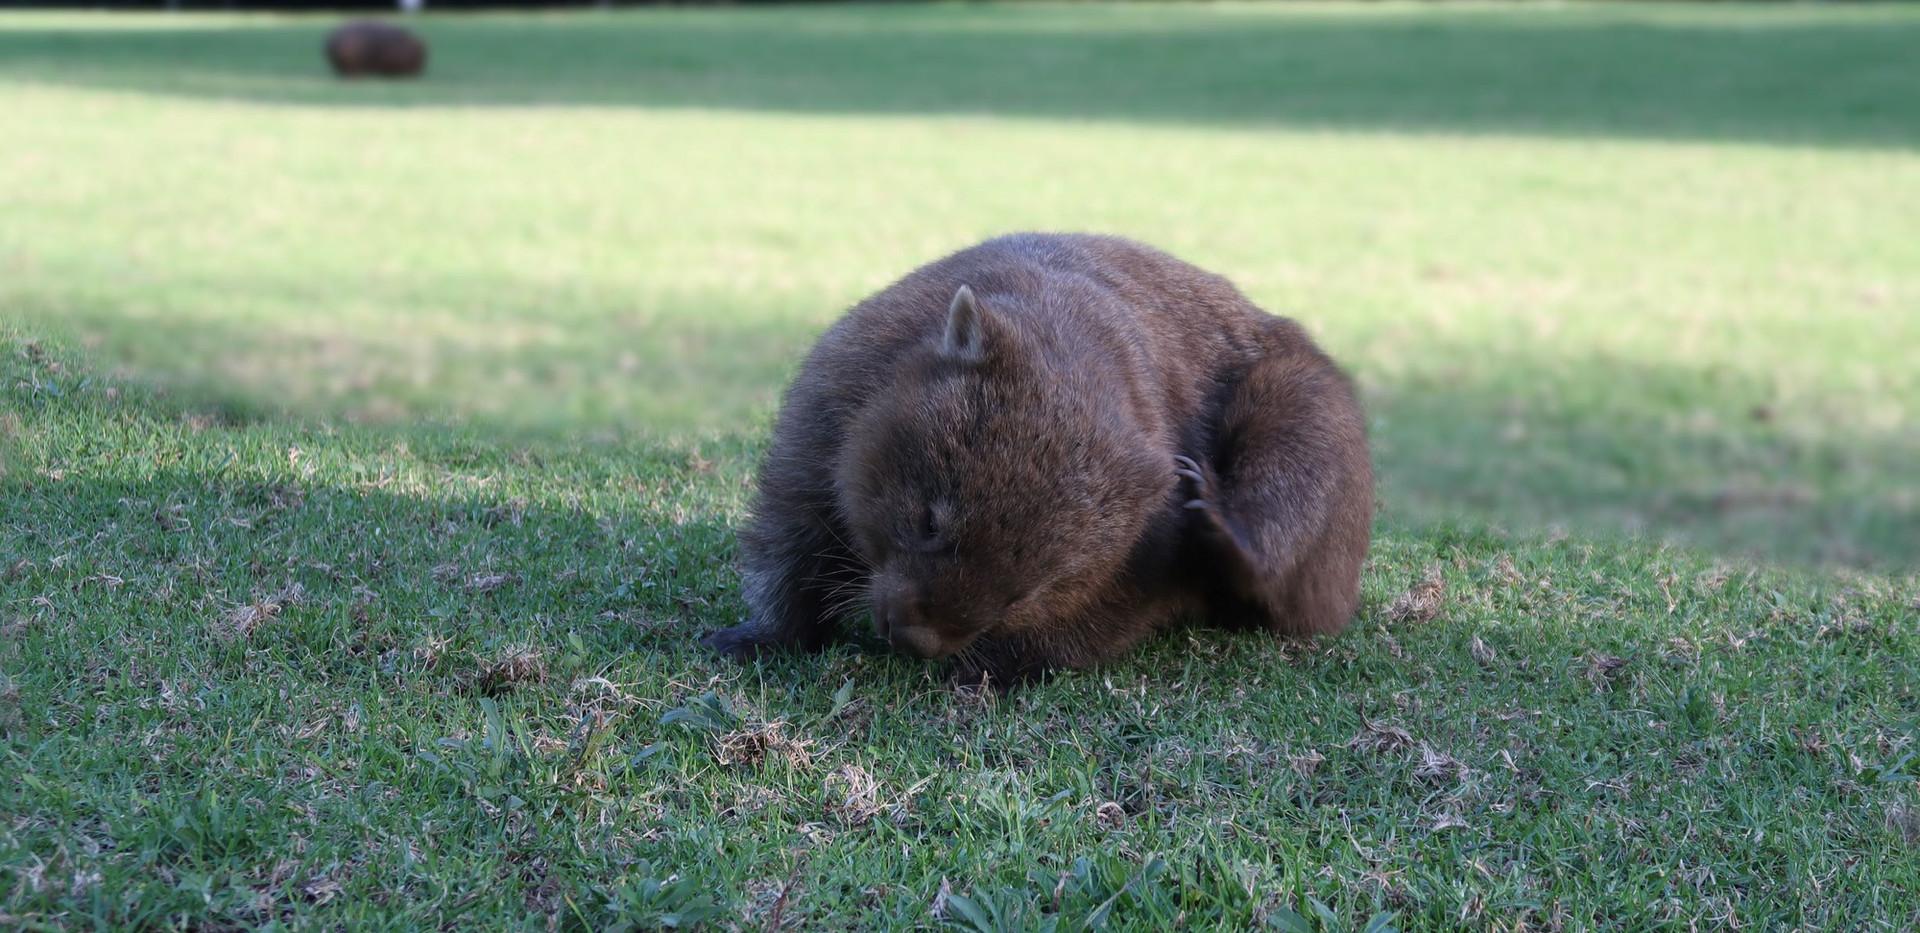 Wombat scratching